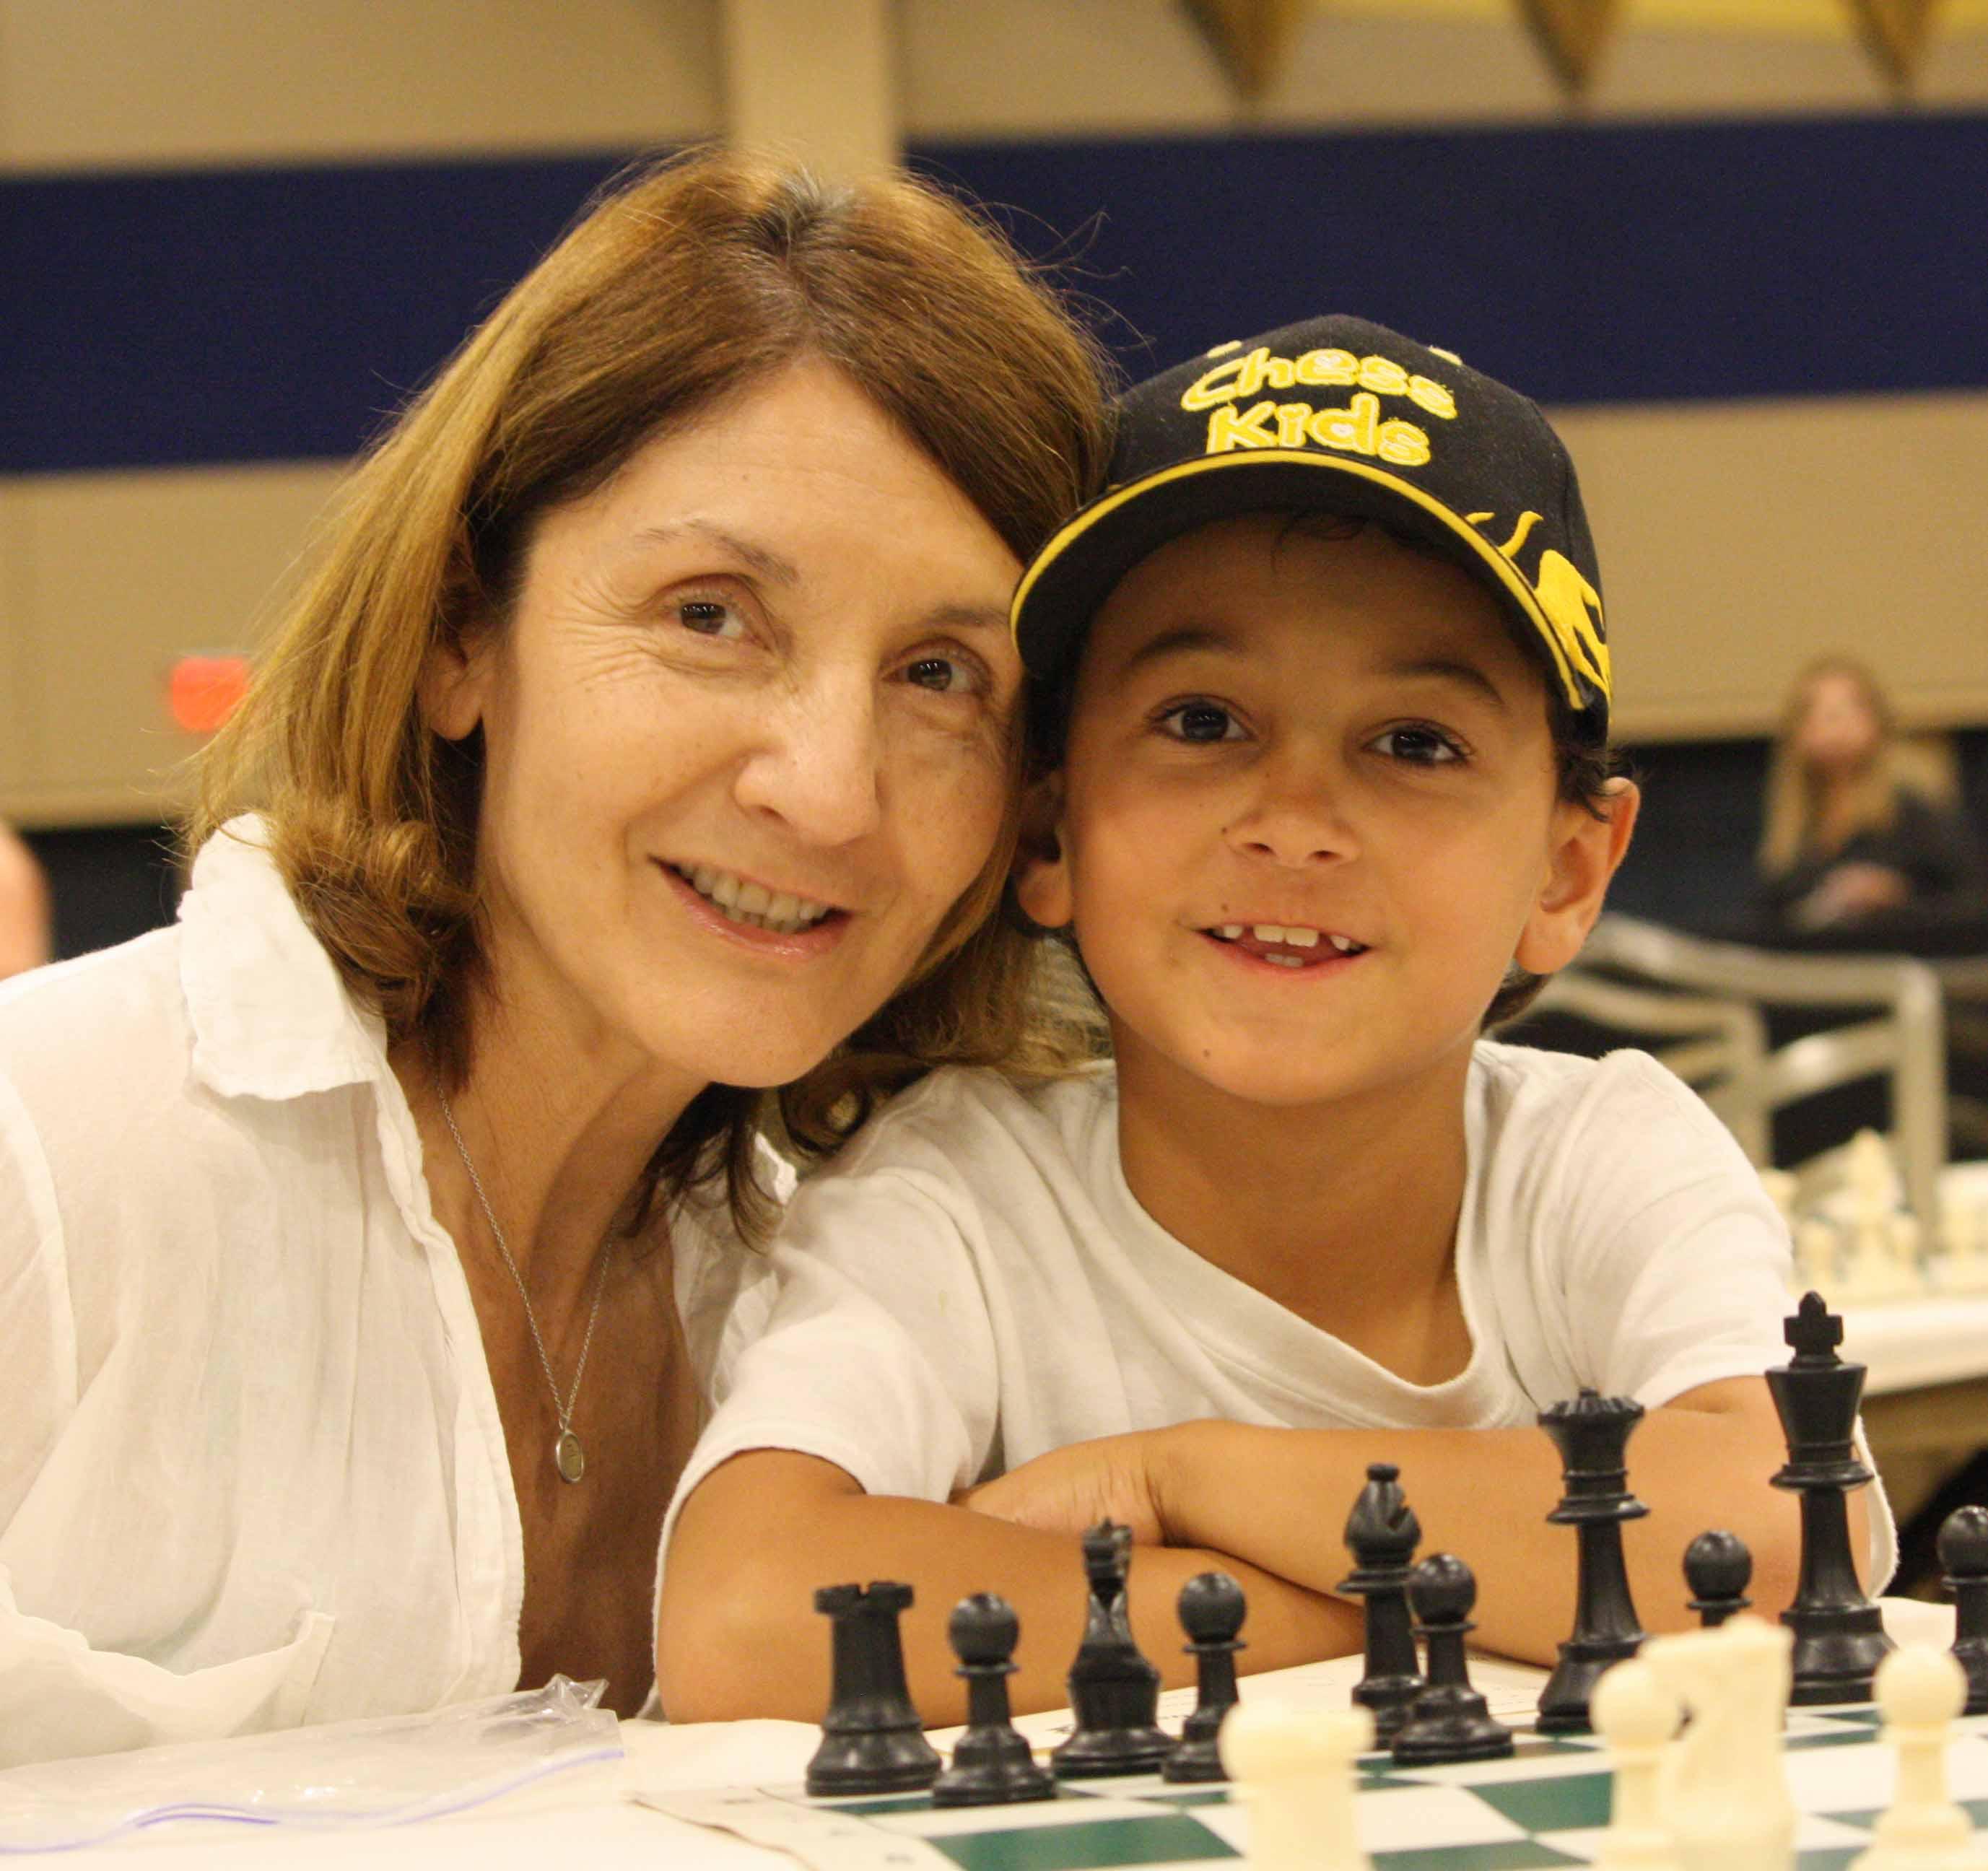 HONORS: Vellotti's Chess Team